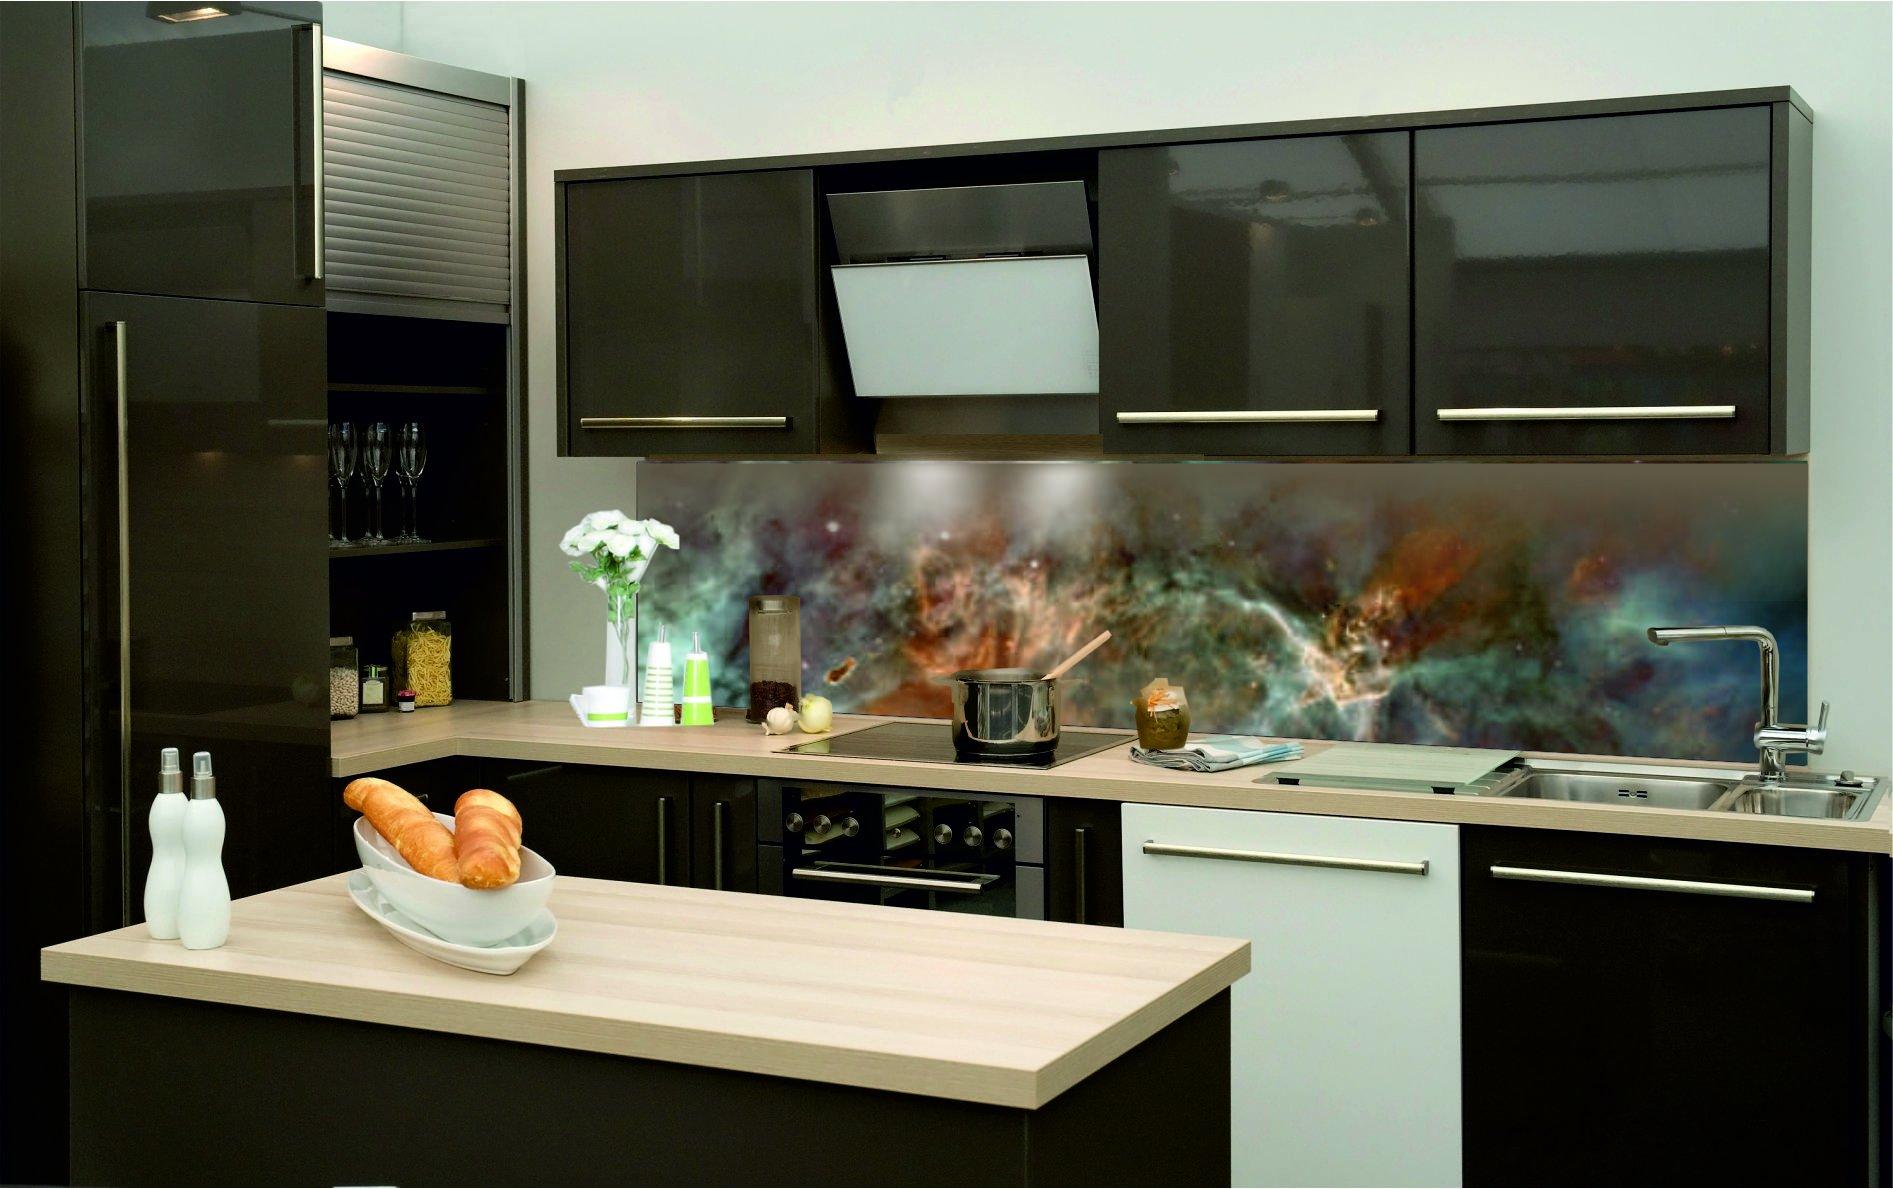 k chenr ckwand hart pvc selbstklebend universum kfs37 ebay. Black Bedroom Furniture Sets. Home Design Ideas